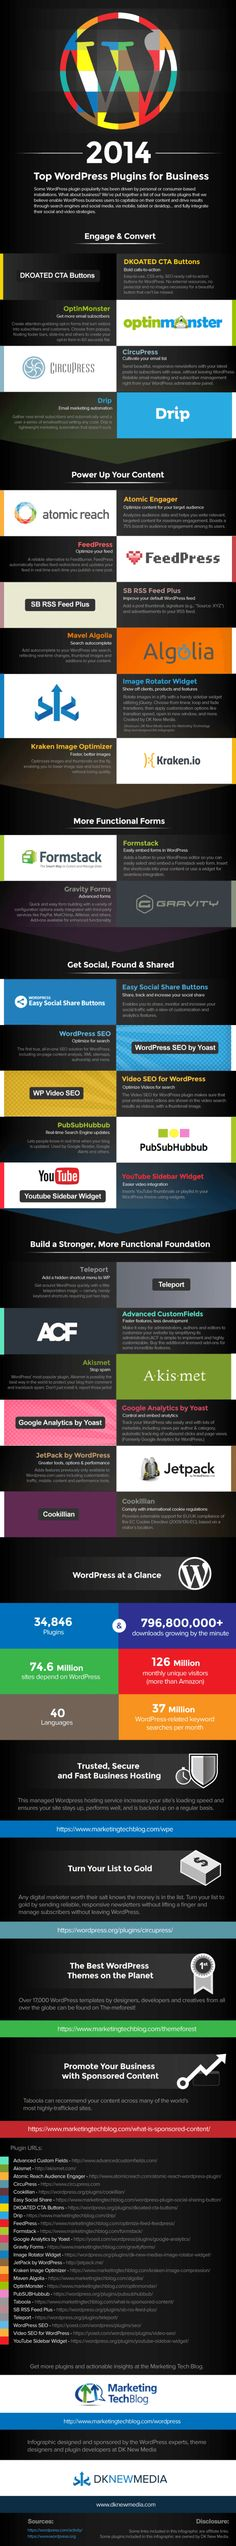 2014 Top Wordpress Plugins for business #INFOGRAFIA #INFOGRAPHIC #SOCIALMEDIA